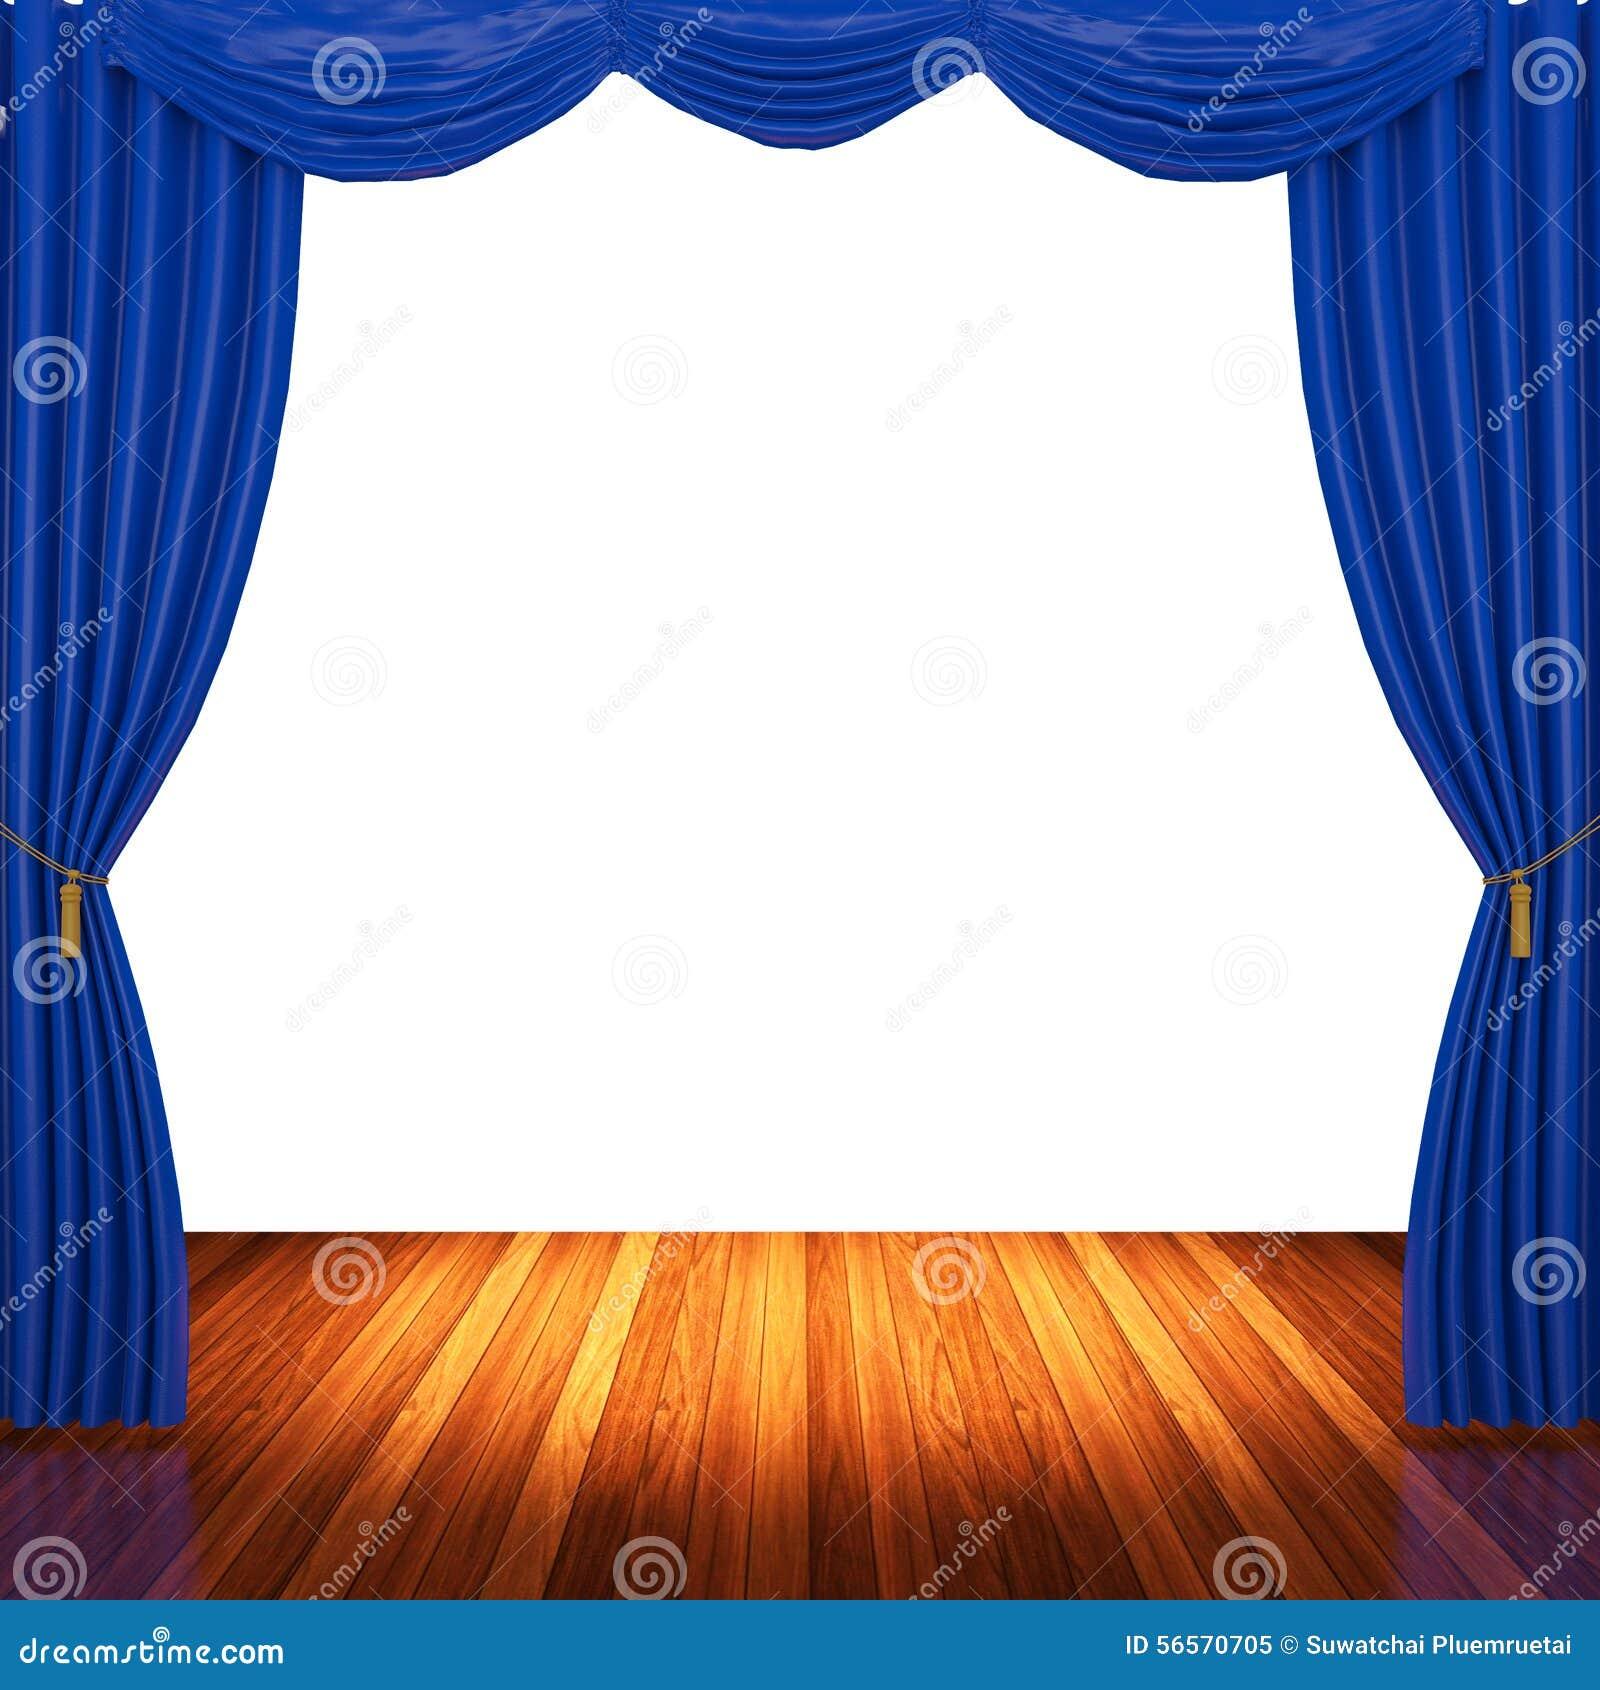 Download Στάδιο με τις μπλε κουρτίνες και το επίκεντρο Στοκ Εικόνα - εικόνα από ορχήστρα, όπερα: 56570705